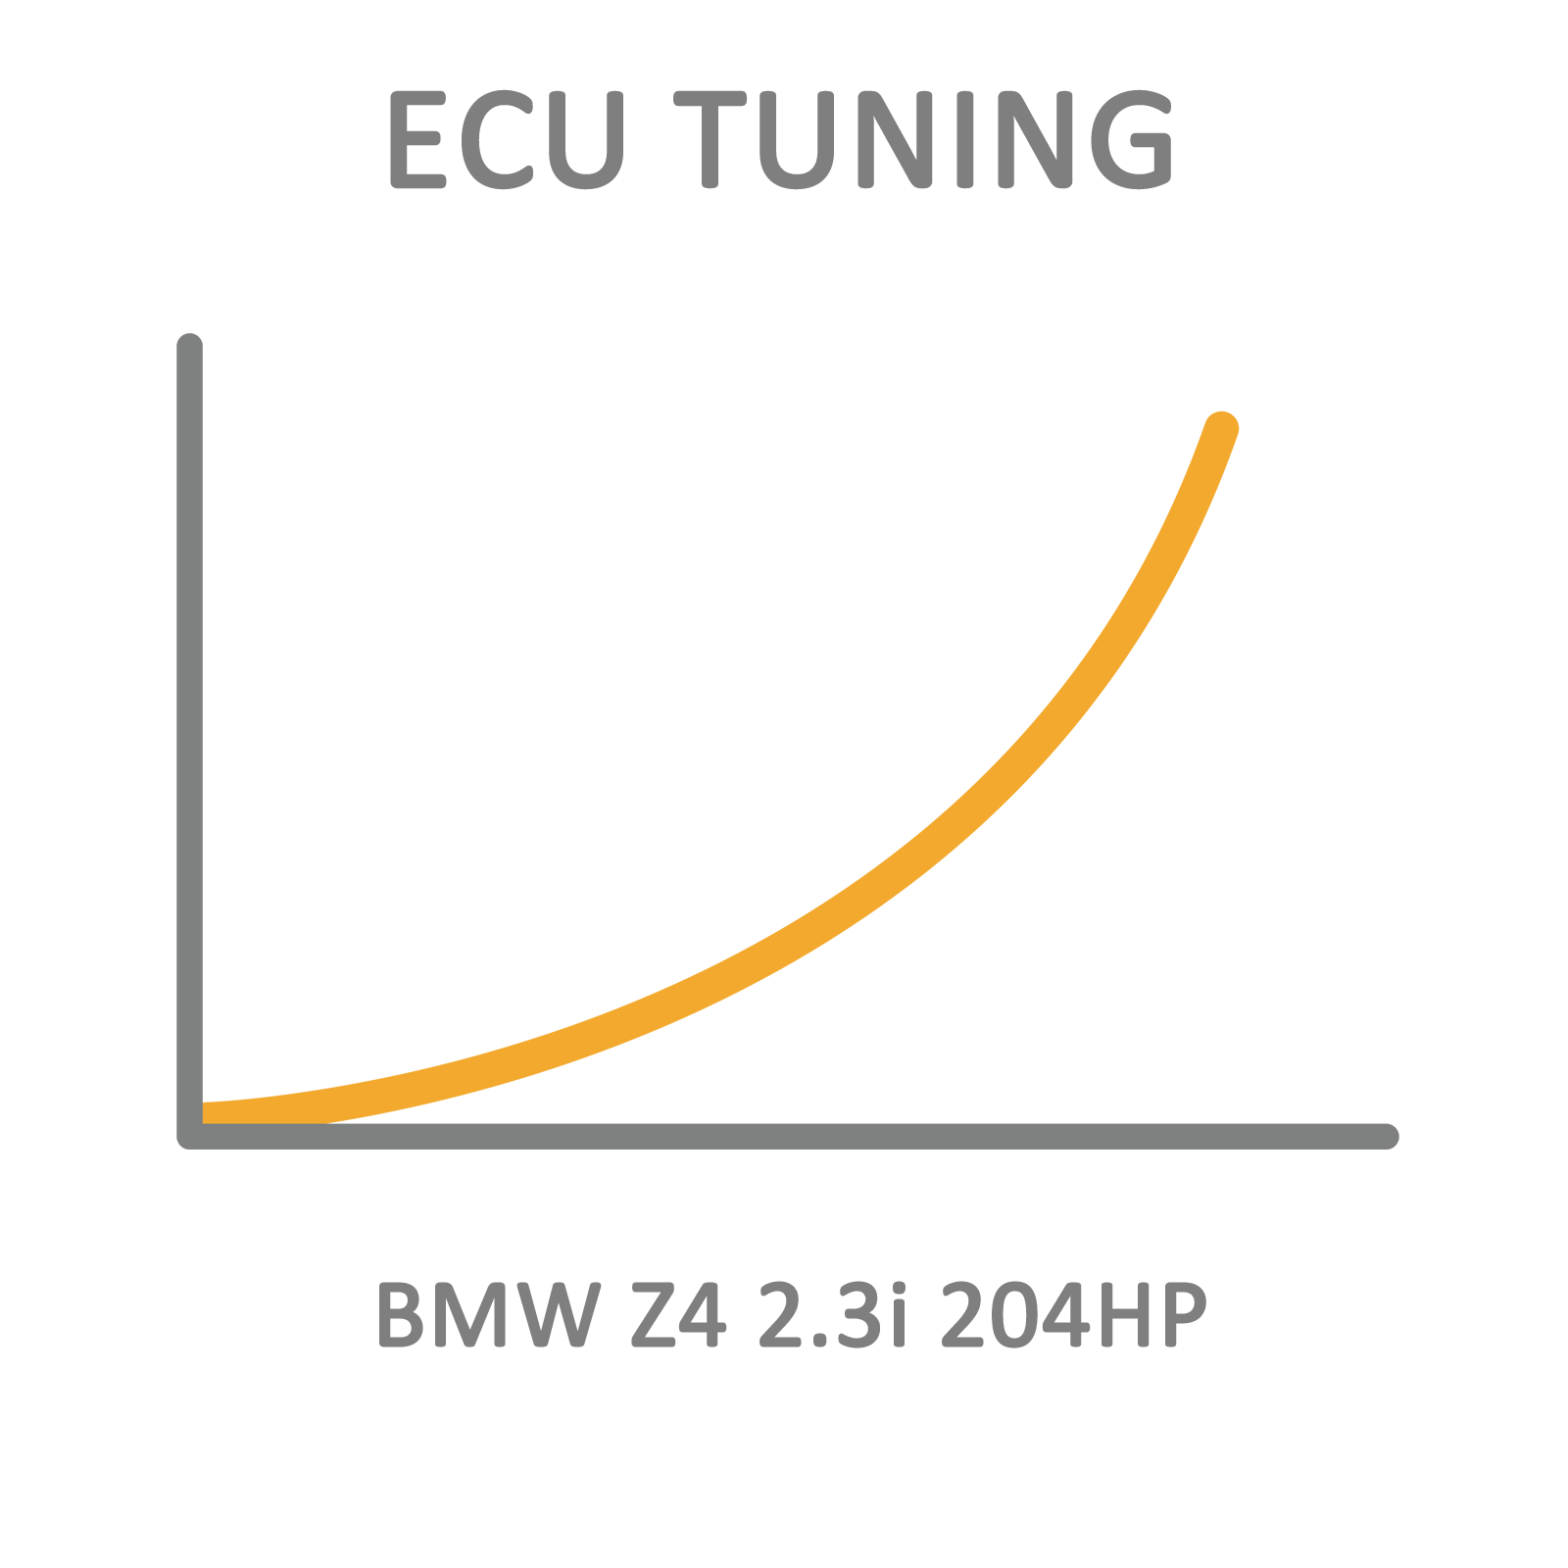 BMW Z4 2.3i 204HP ECU Tuning Remapping Programming